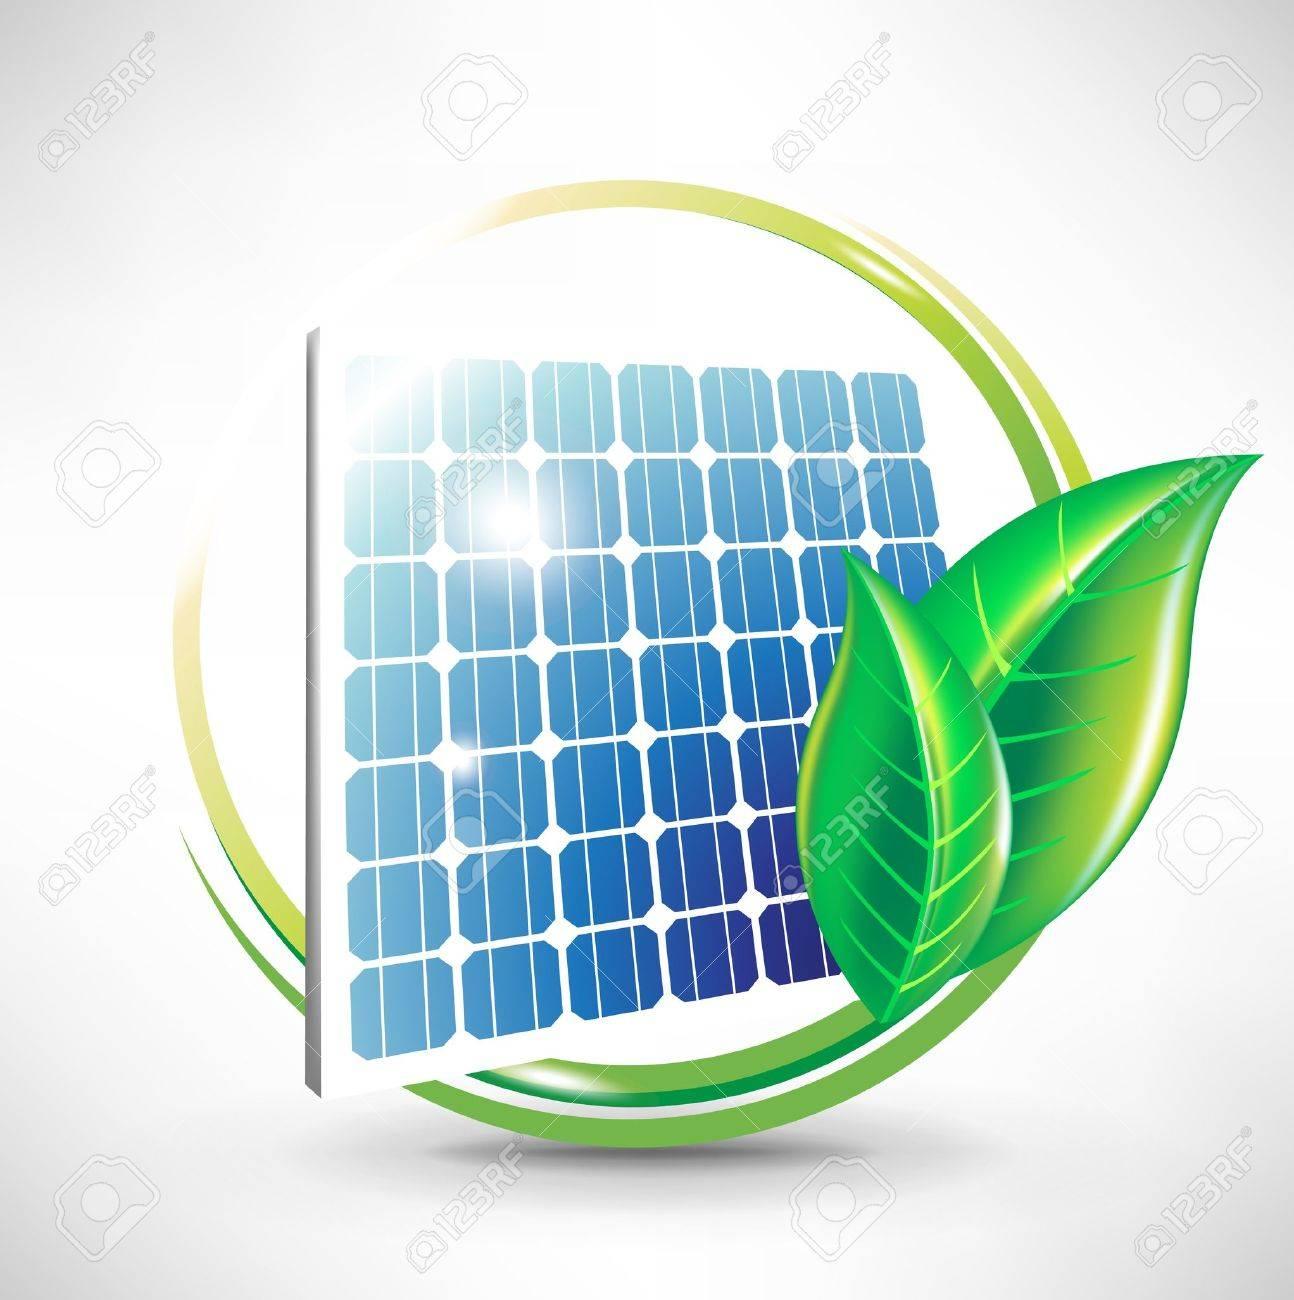 alternative solar energy; solar panel icon with leaves Stock Vector - 10959833